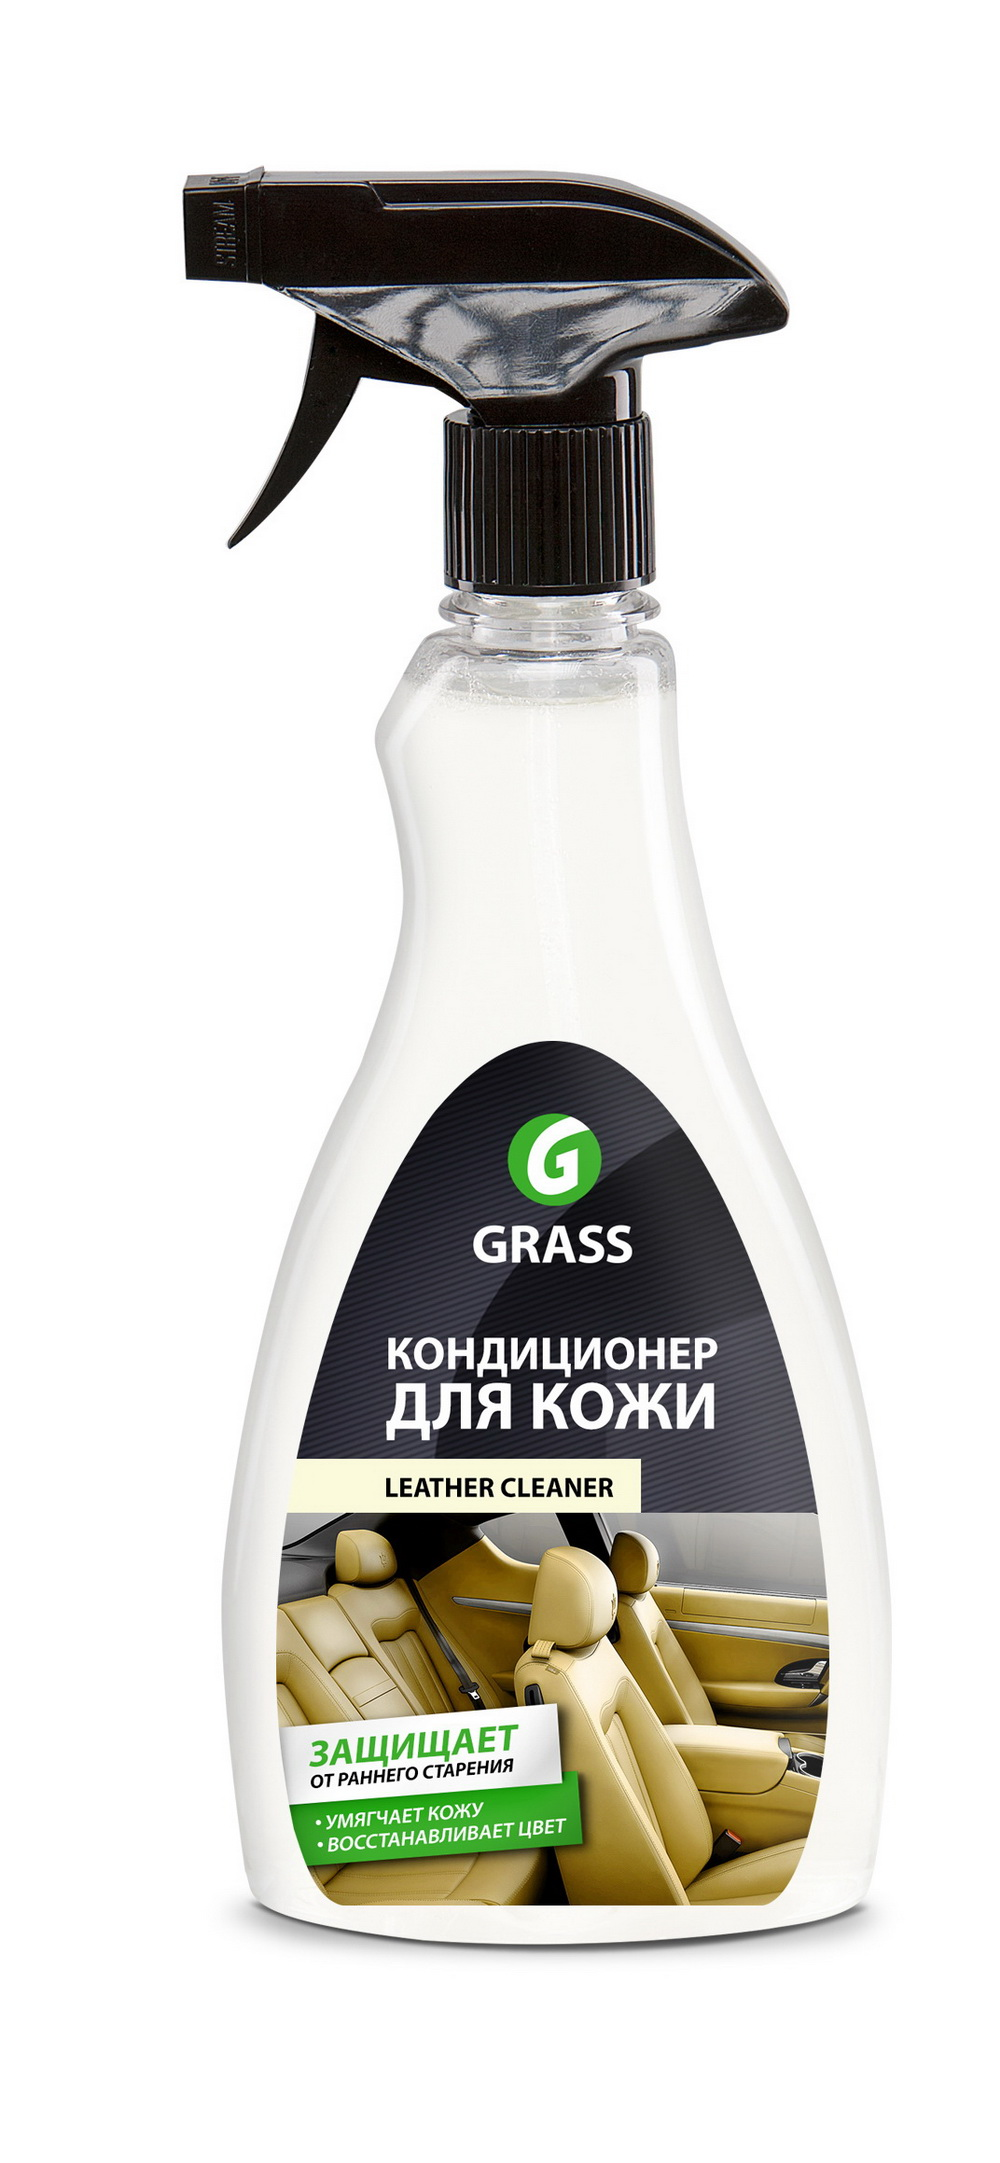 Кондиционер Grass